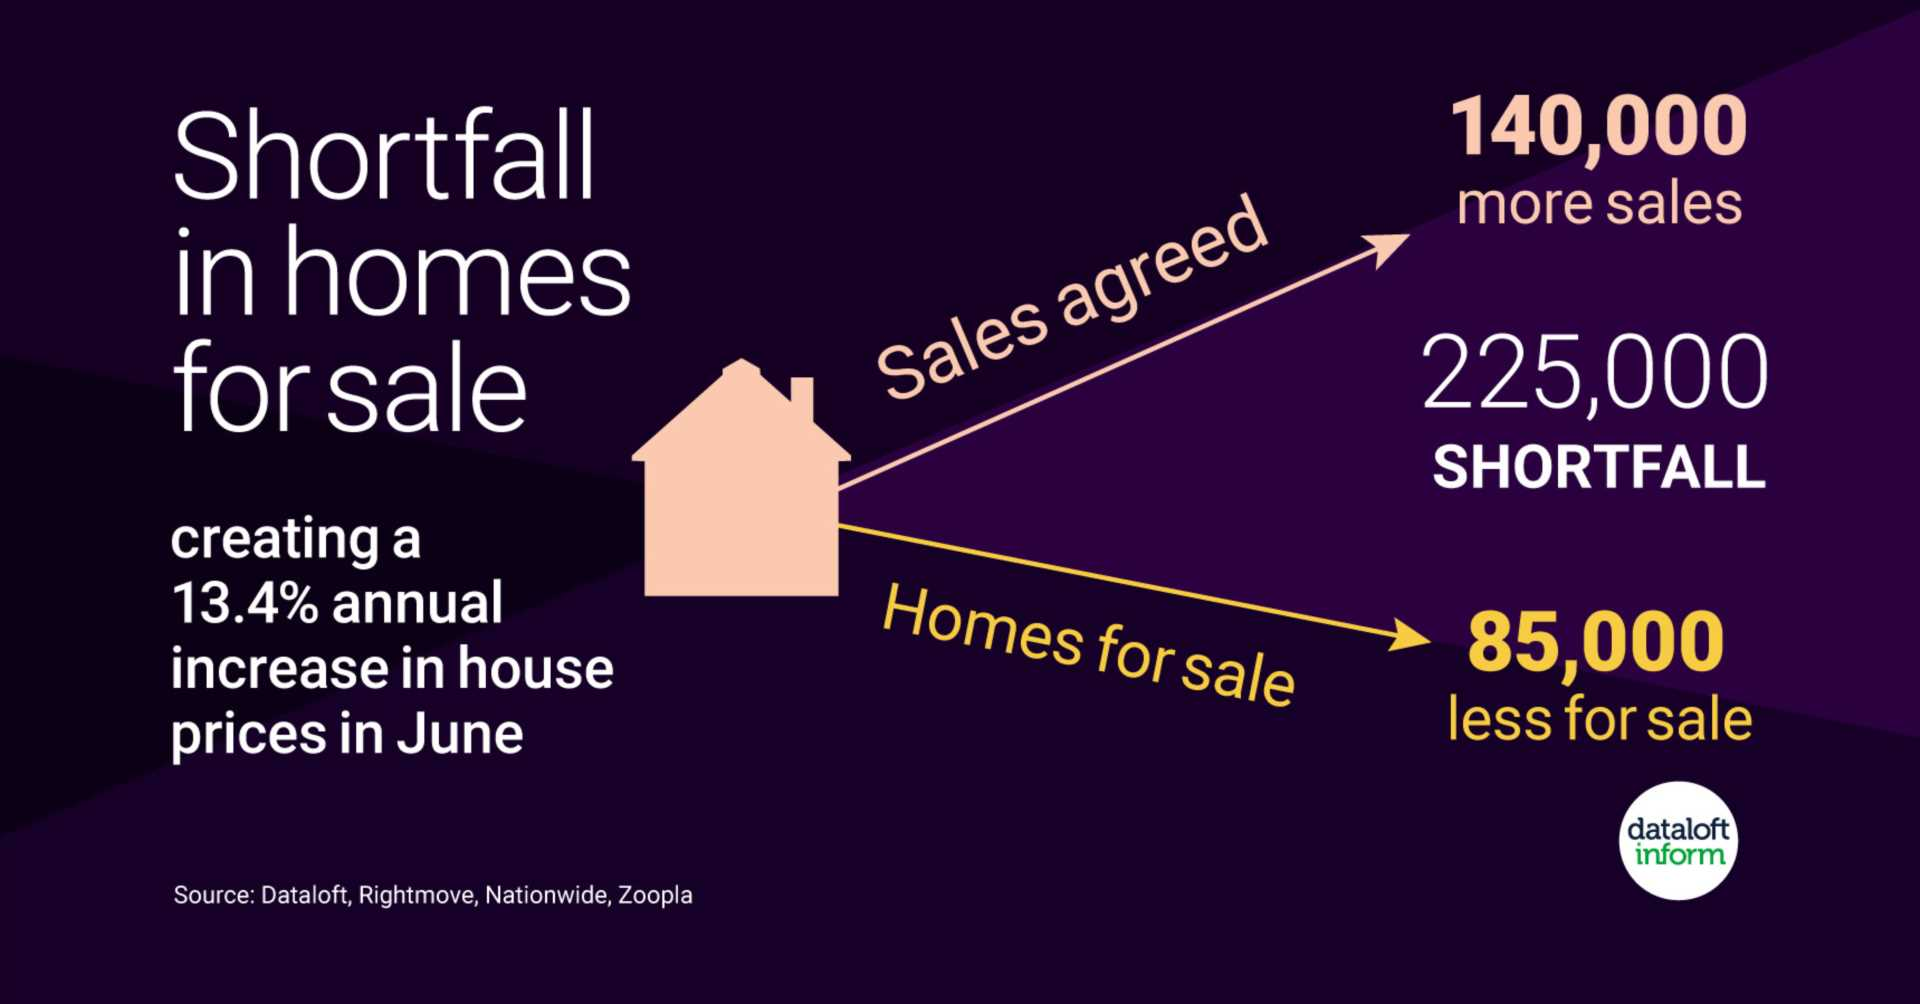 Shortfall in homes for sale